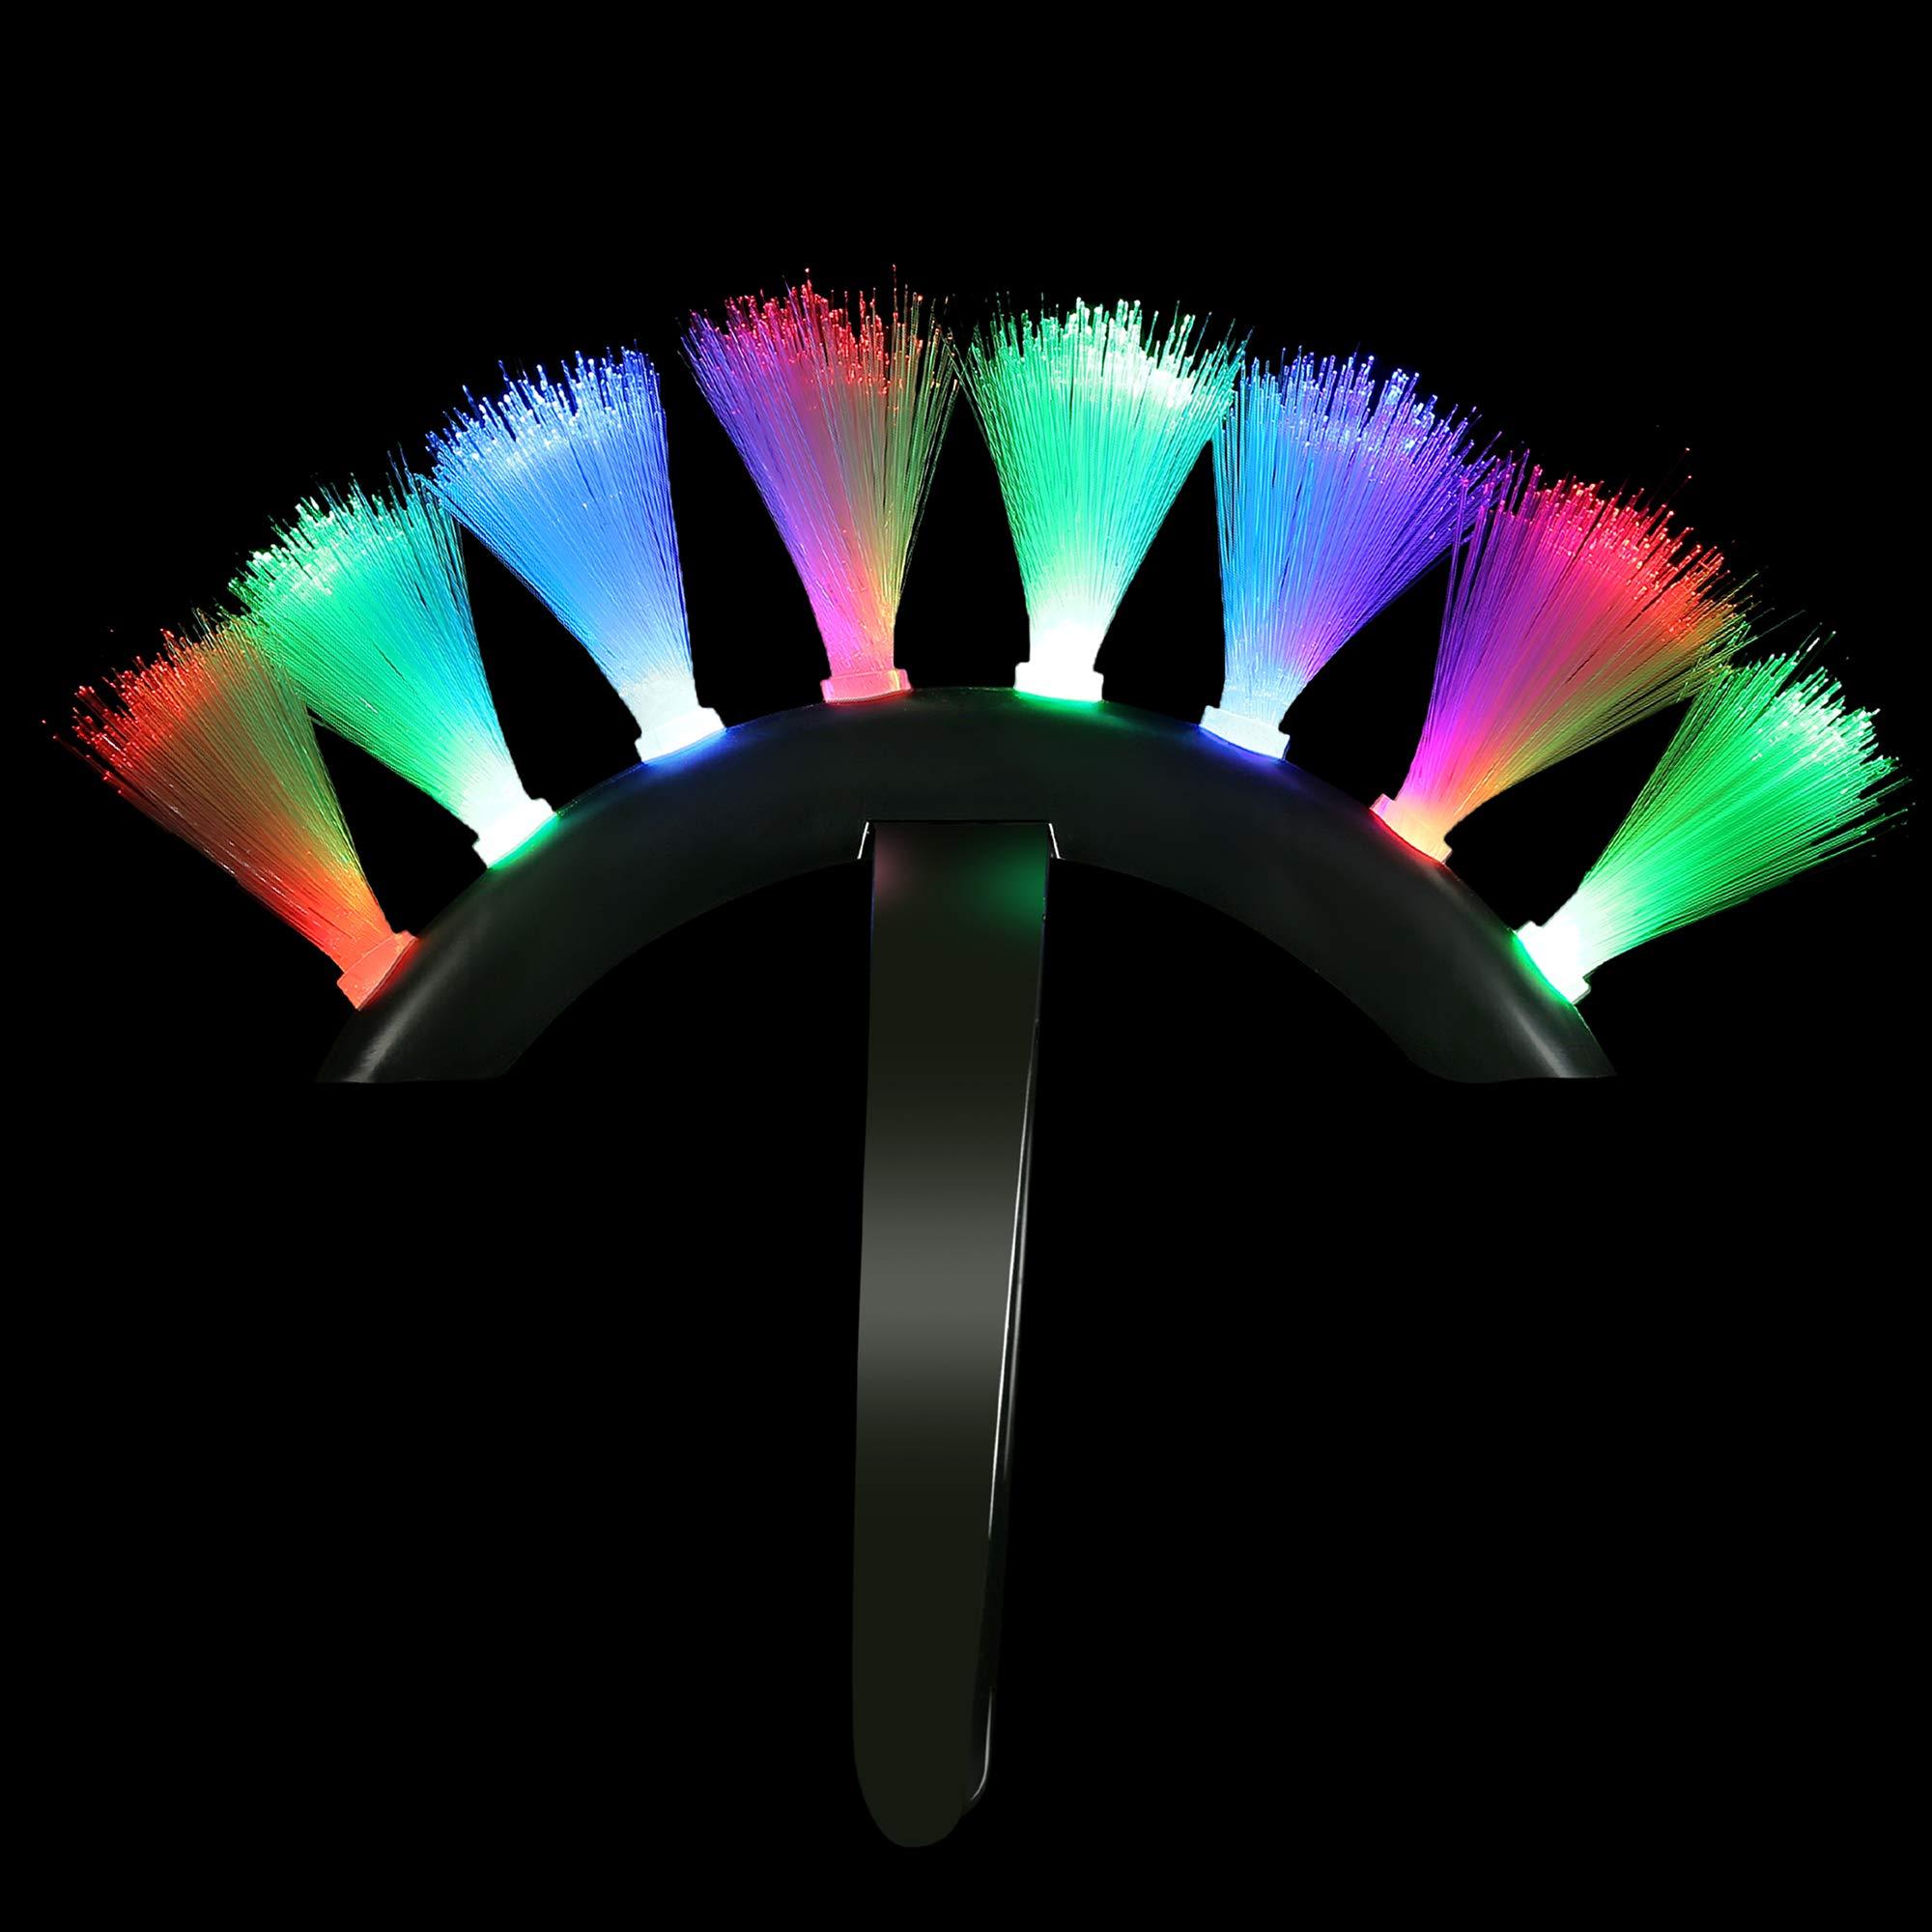 Fun Central LED Light Up Fiber Optic Mohawk Wig Headband for Women & Men